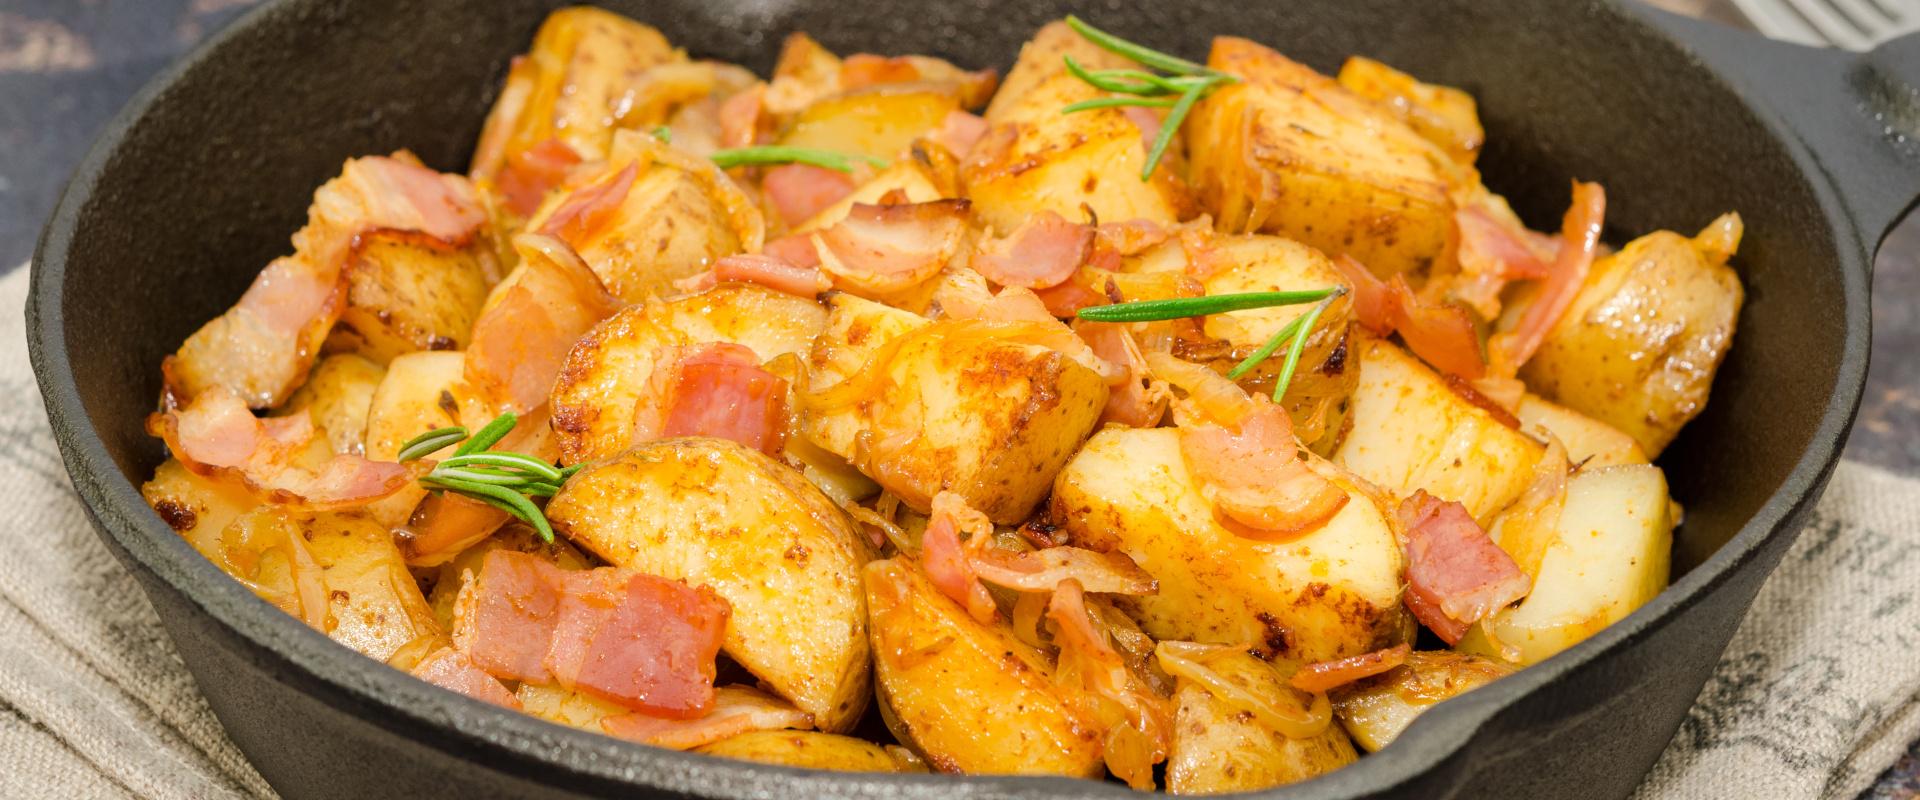 sörrel sült krumpli